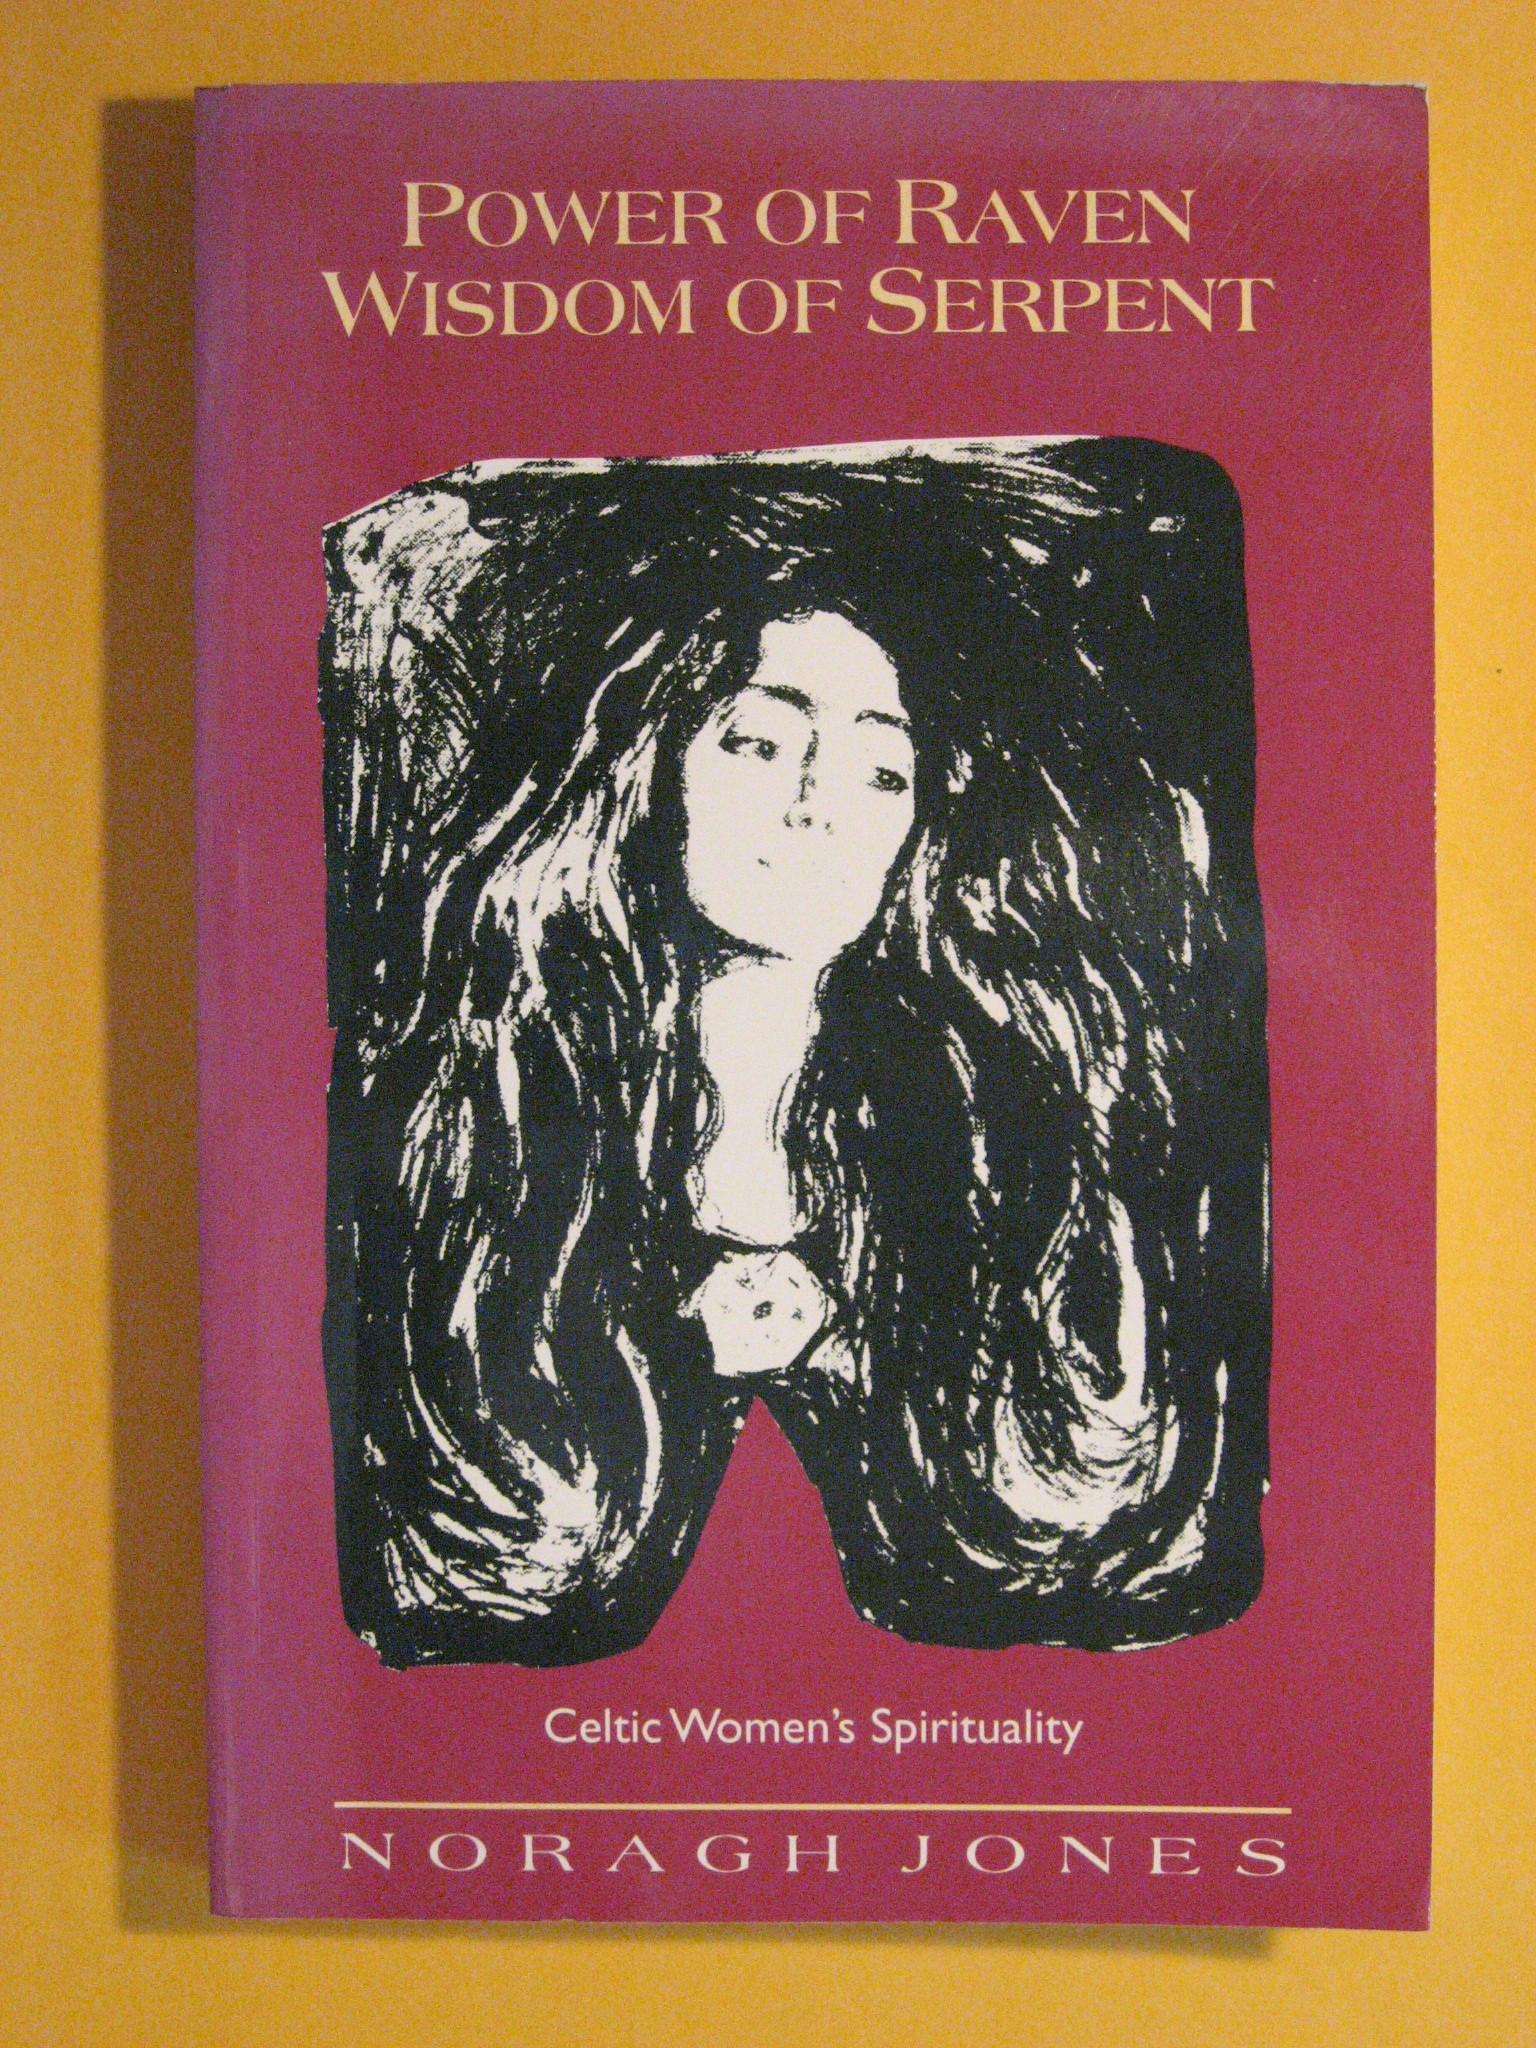 Power of Raven, Wisdom of Serpent: Celtic Women's Spirituality, Noragh Jones